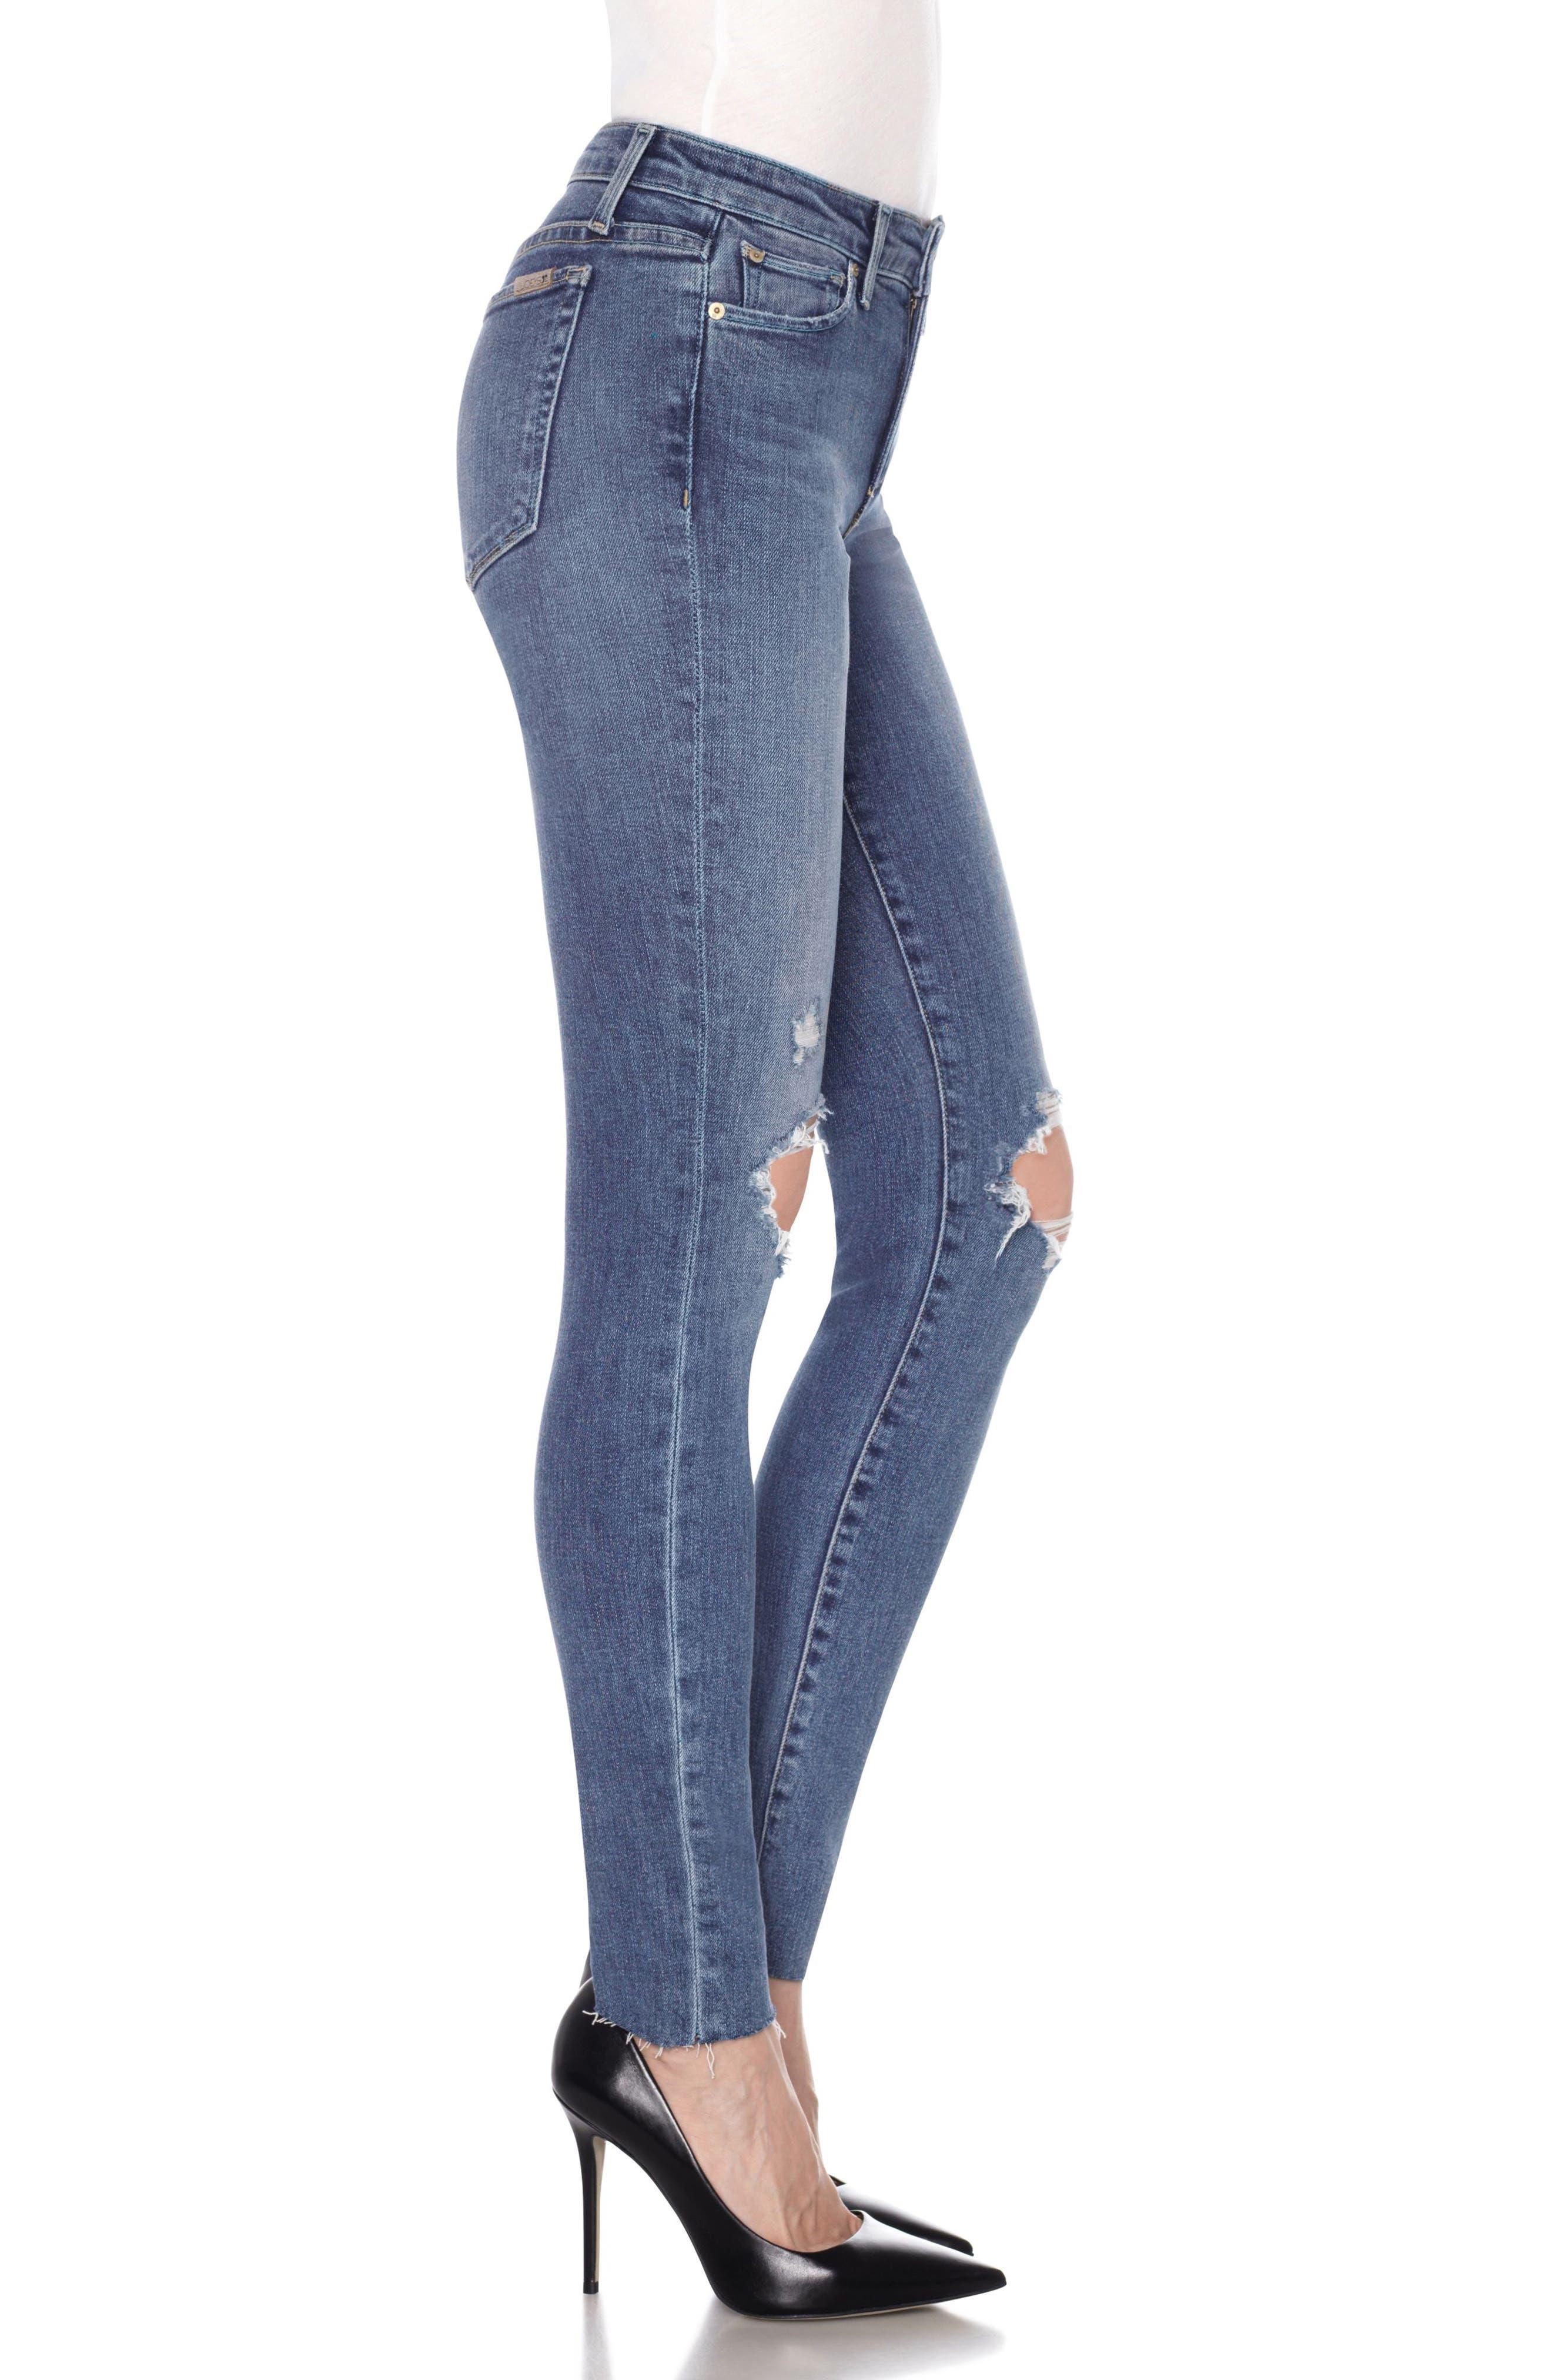 Icon High Waist Skinny Jeans,                             Alternate thumbnail 4, color,                             Kiara